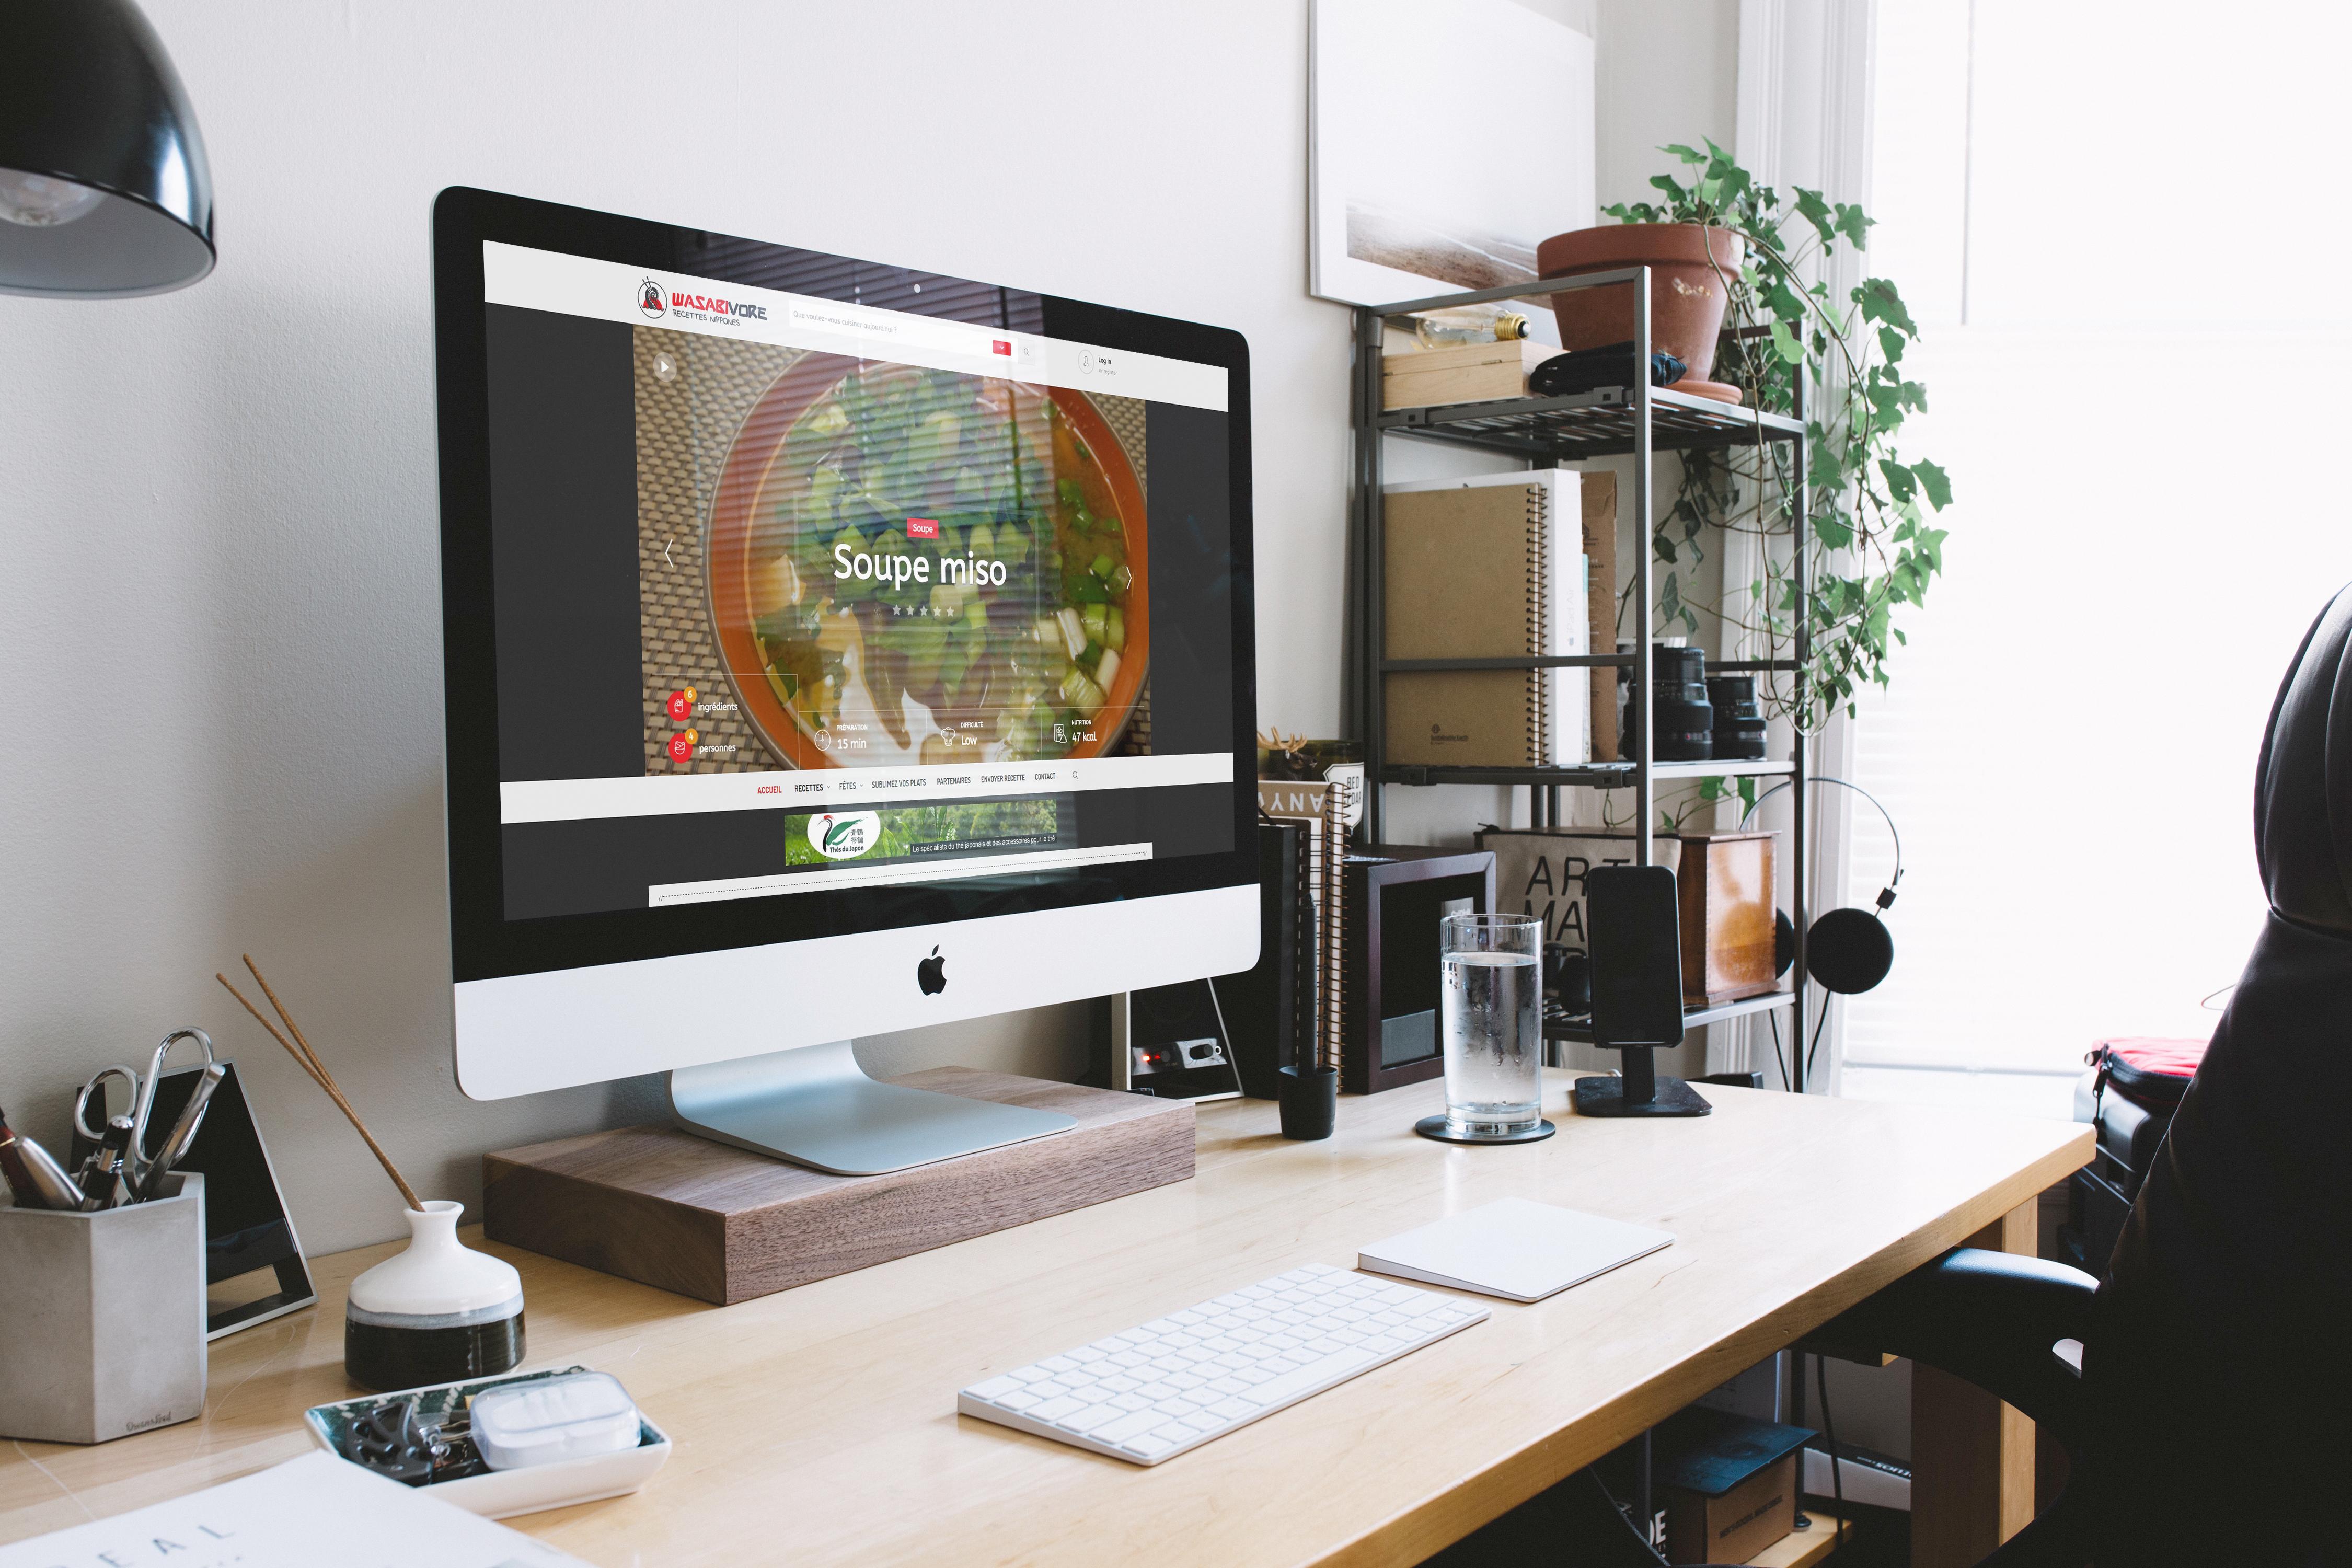 site-internet-wasabivore-ordinateur-mockup